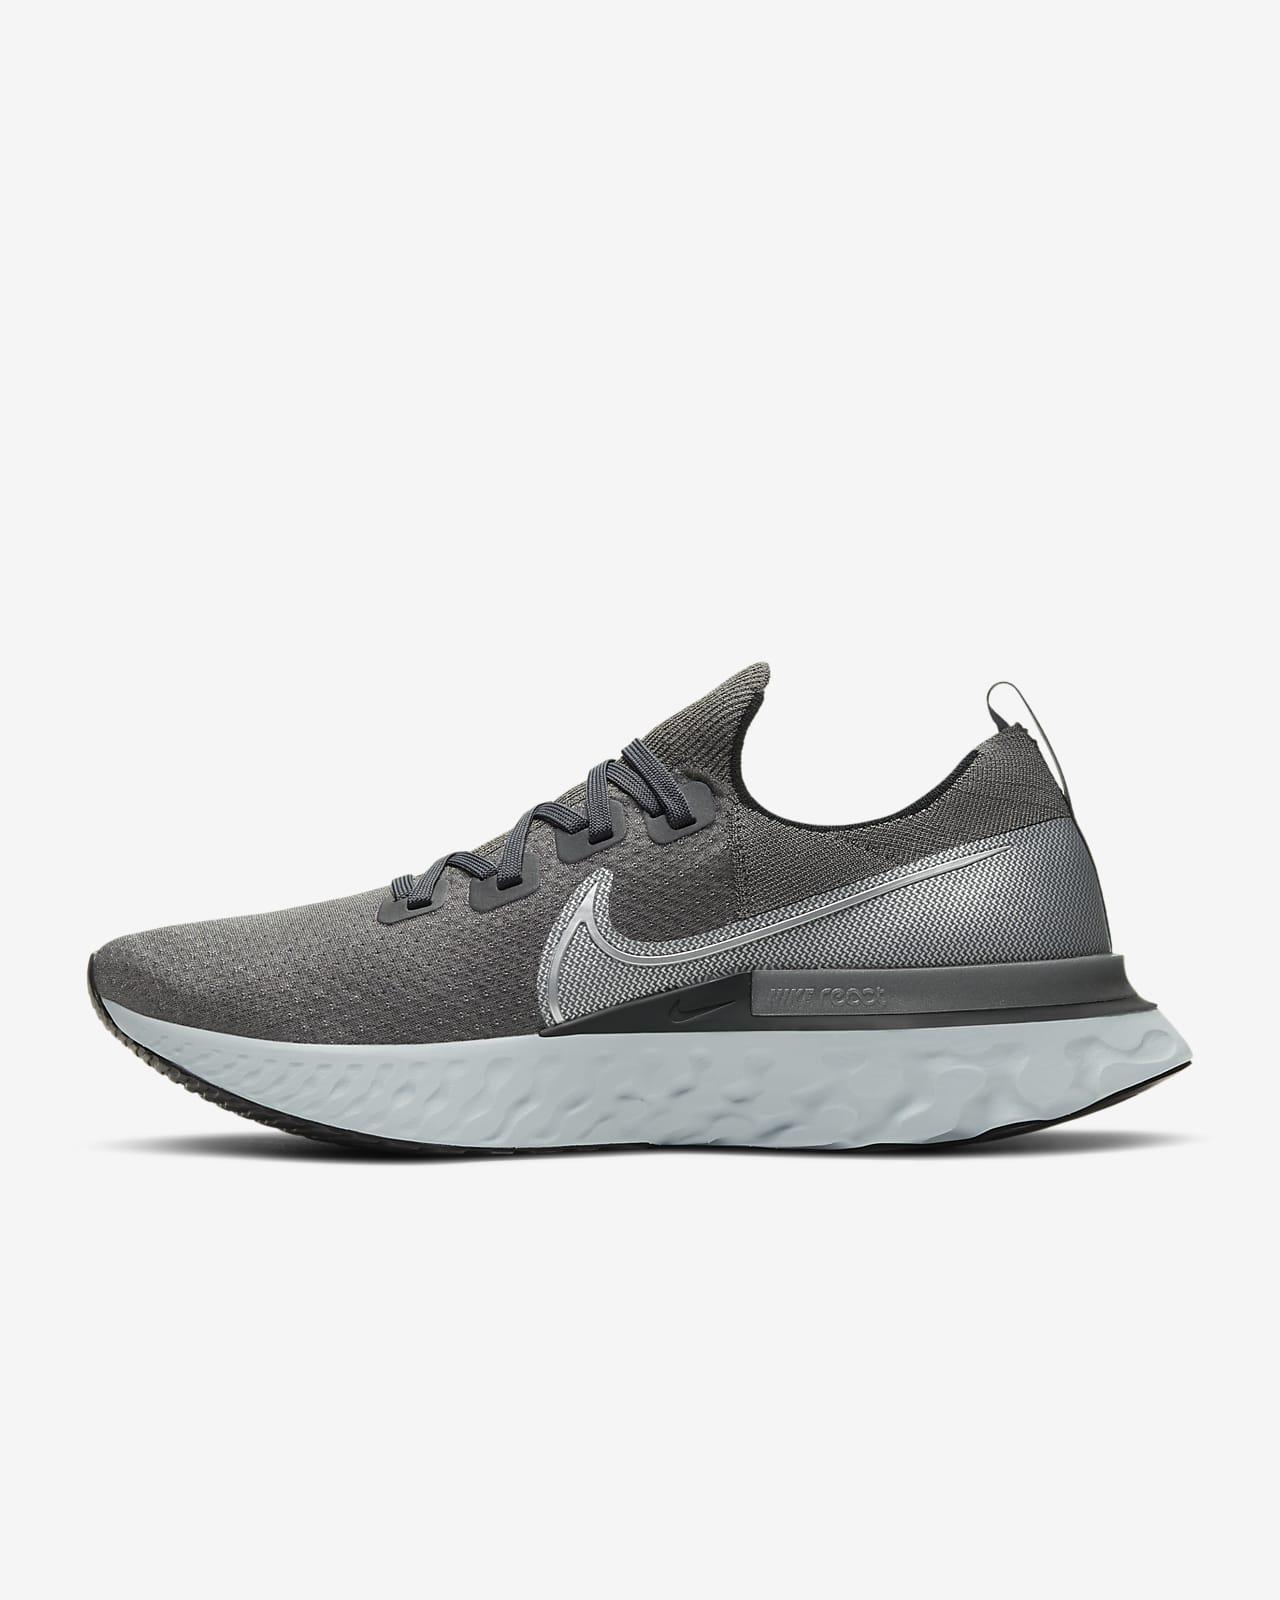 Sapatilhas de running Nike React Infinity Run Flyknit para homem